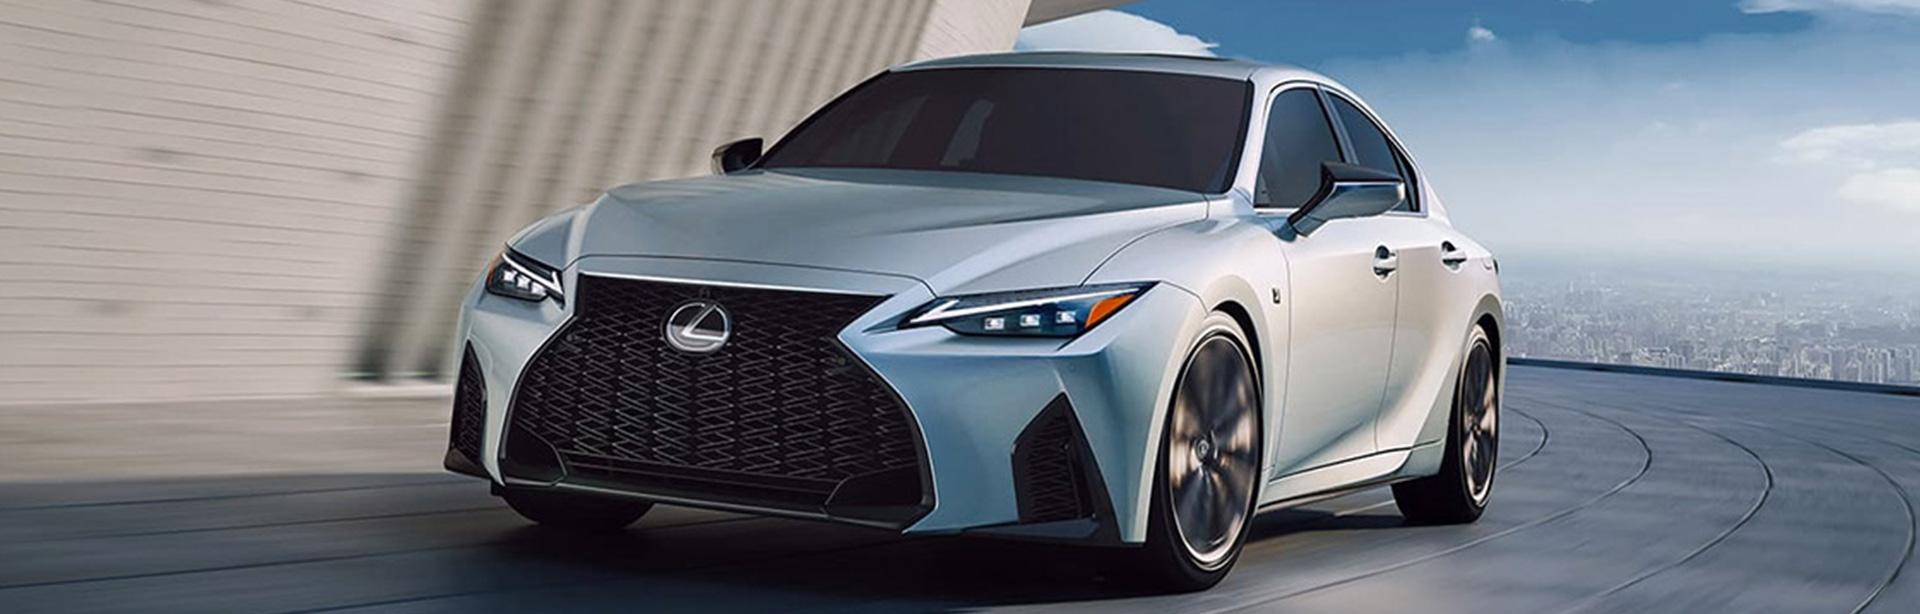 Lexus Certified Collision Repair